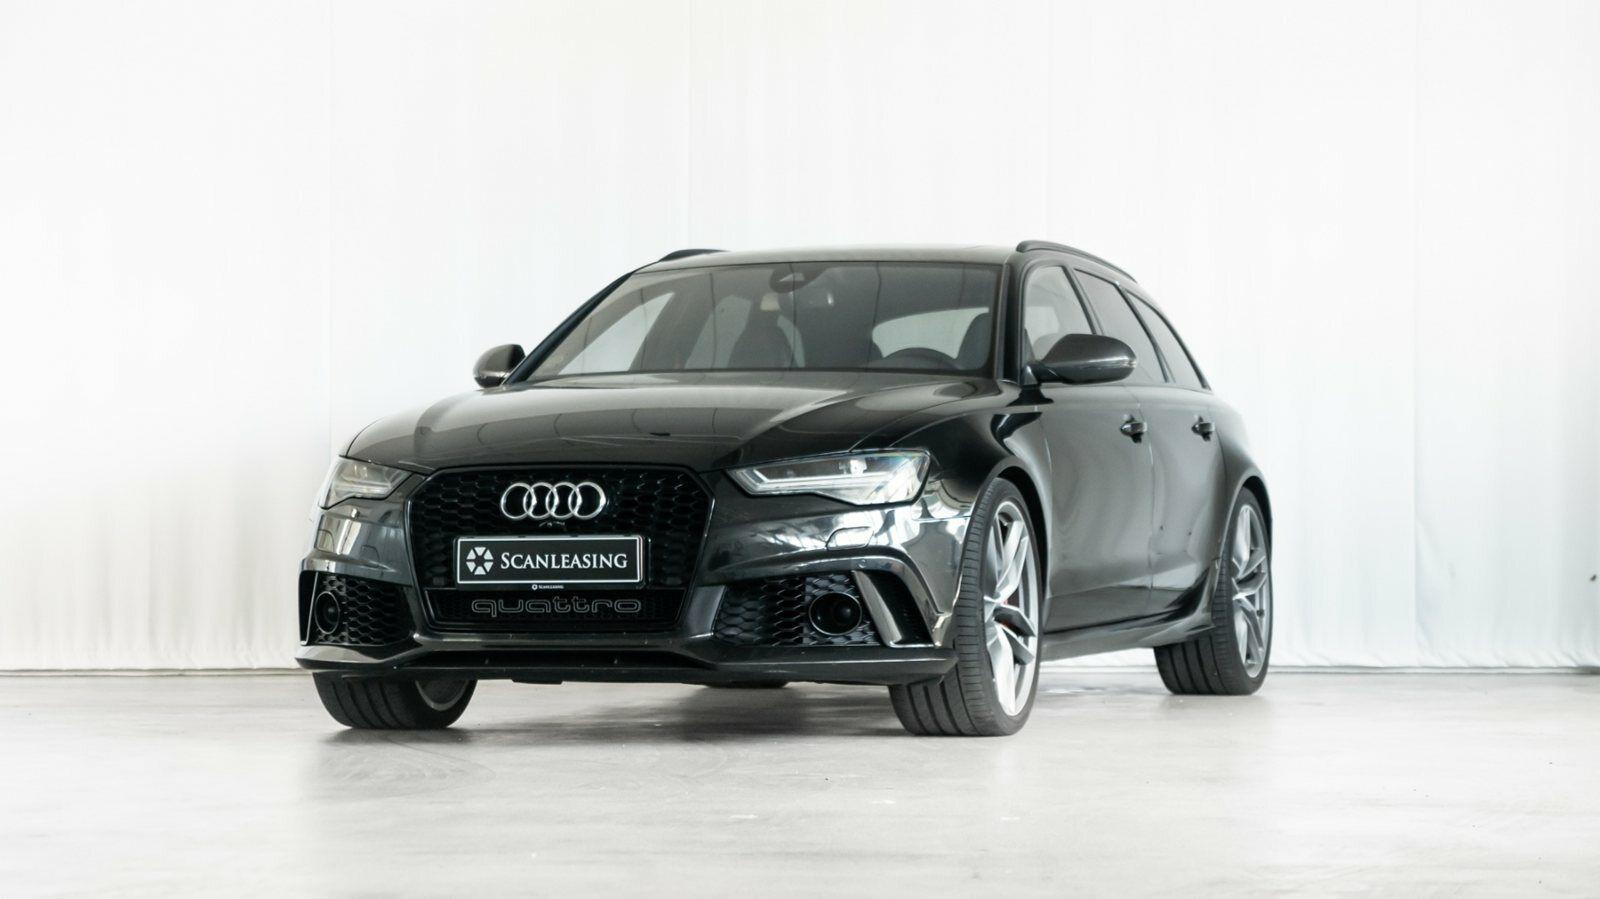 Audi RS6 4,0 TFSi Avant quattro Tiptr. 5d - 1.299.900 kr.